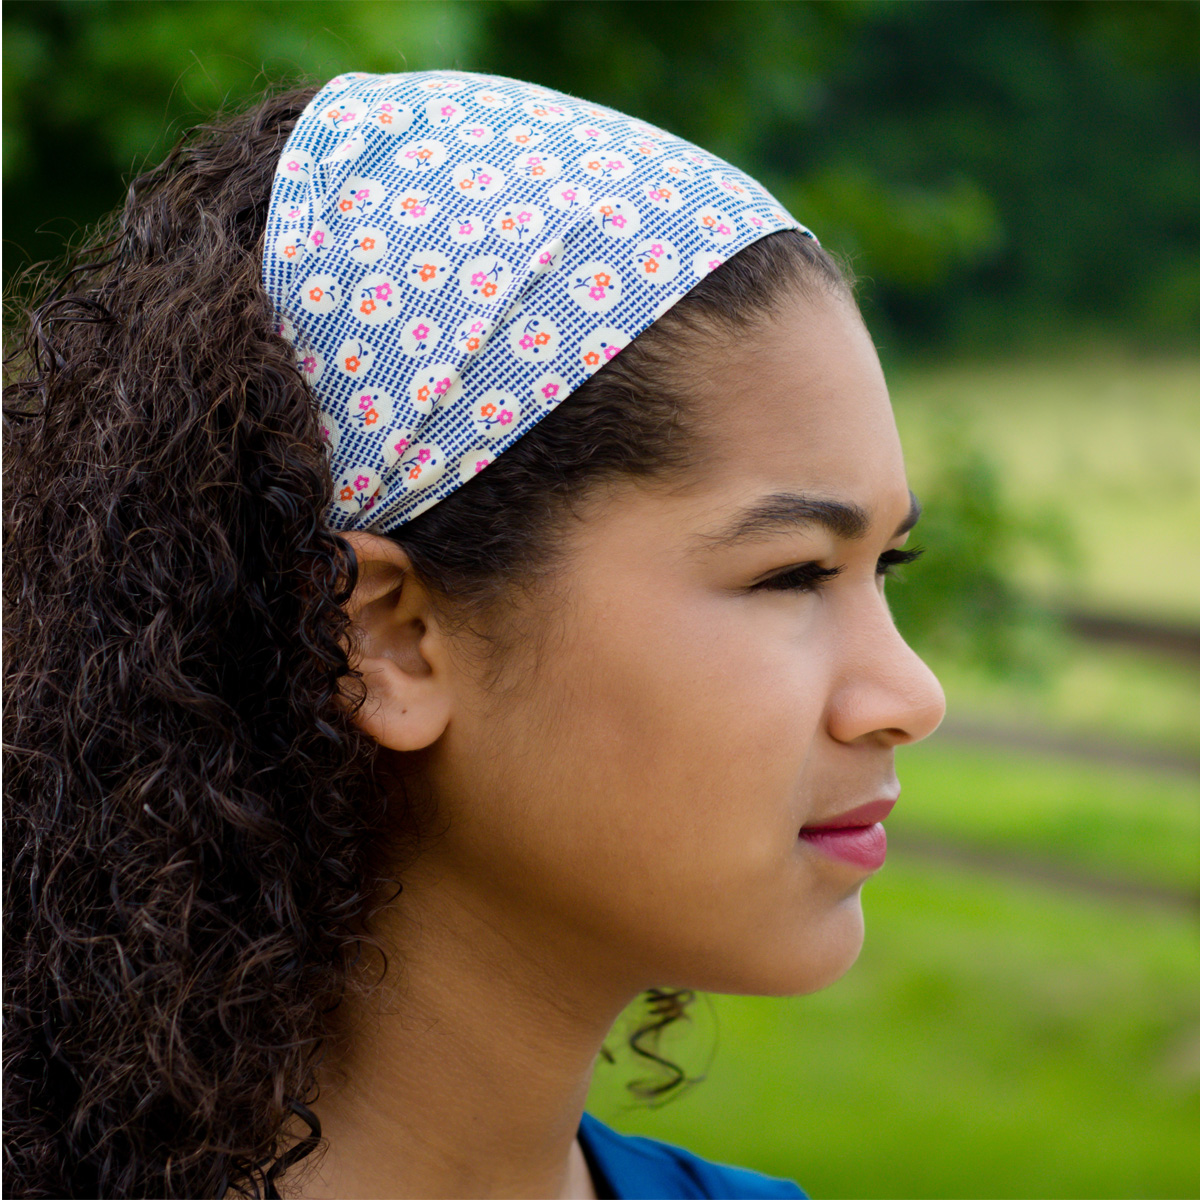 Stylish Fashion Headbands From Specifically Random Beverly